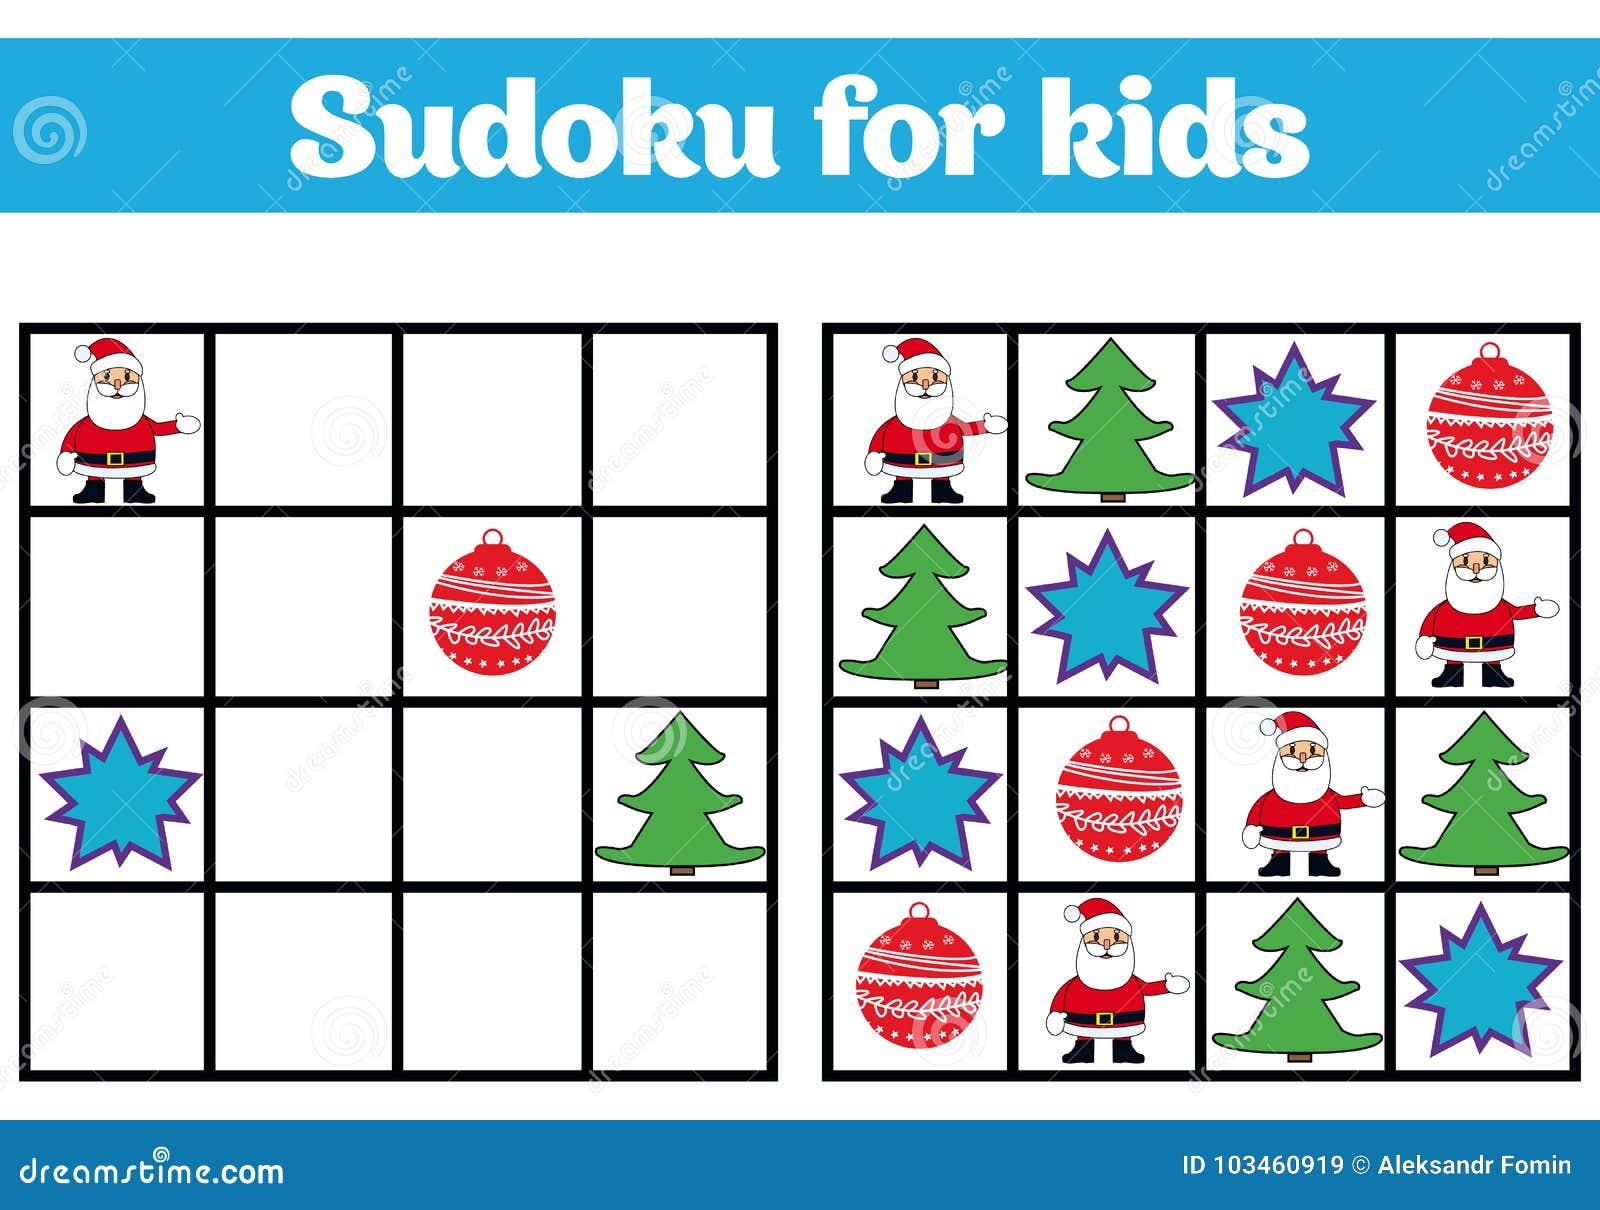 Fein Sudoku Rastervorlage Zeitgenössisch - Entry Level Resume ...